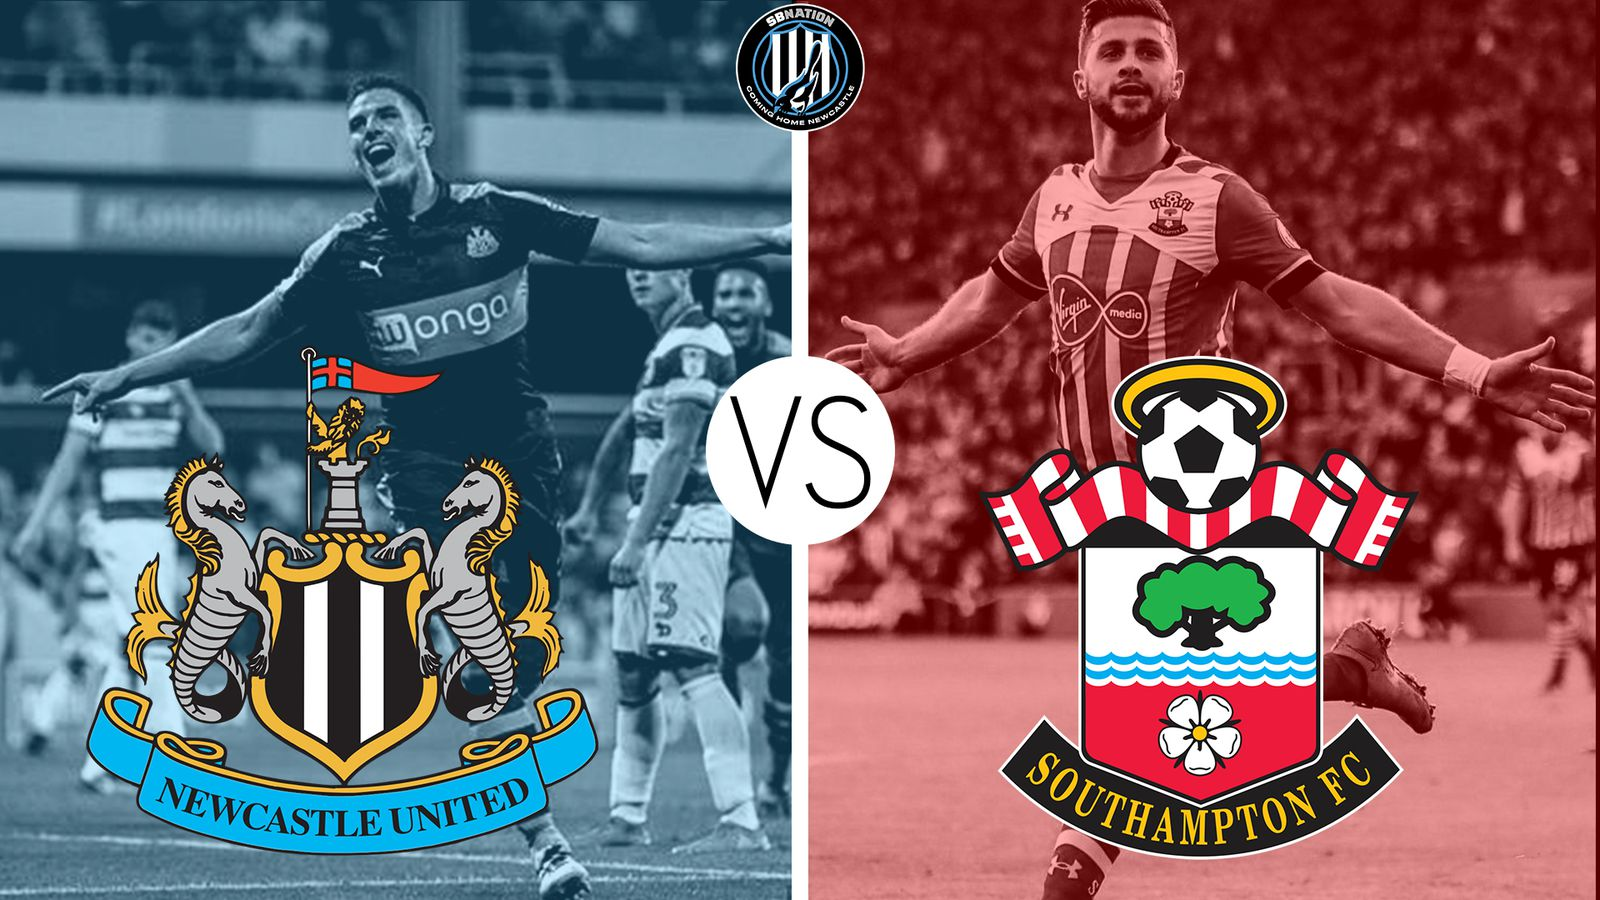 Newcastle_vs_southhampton.0